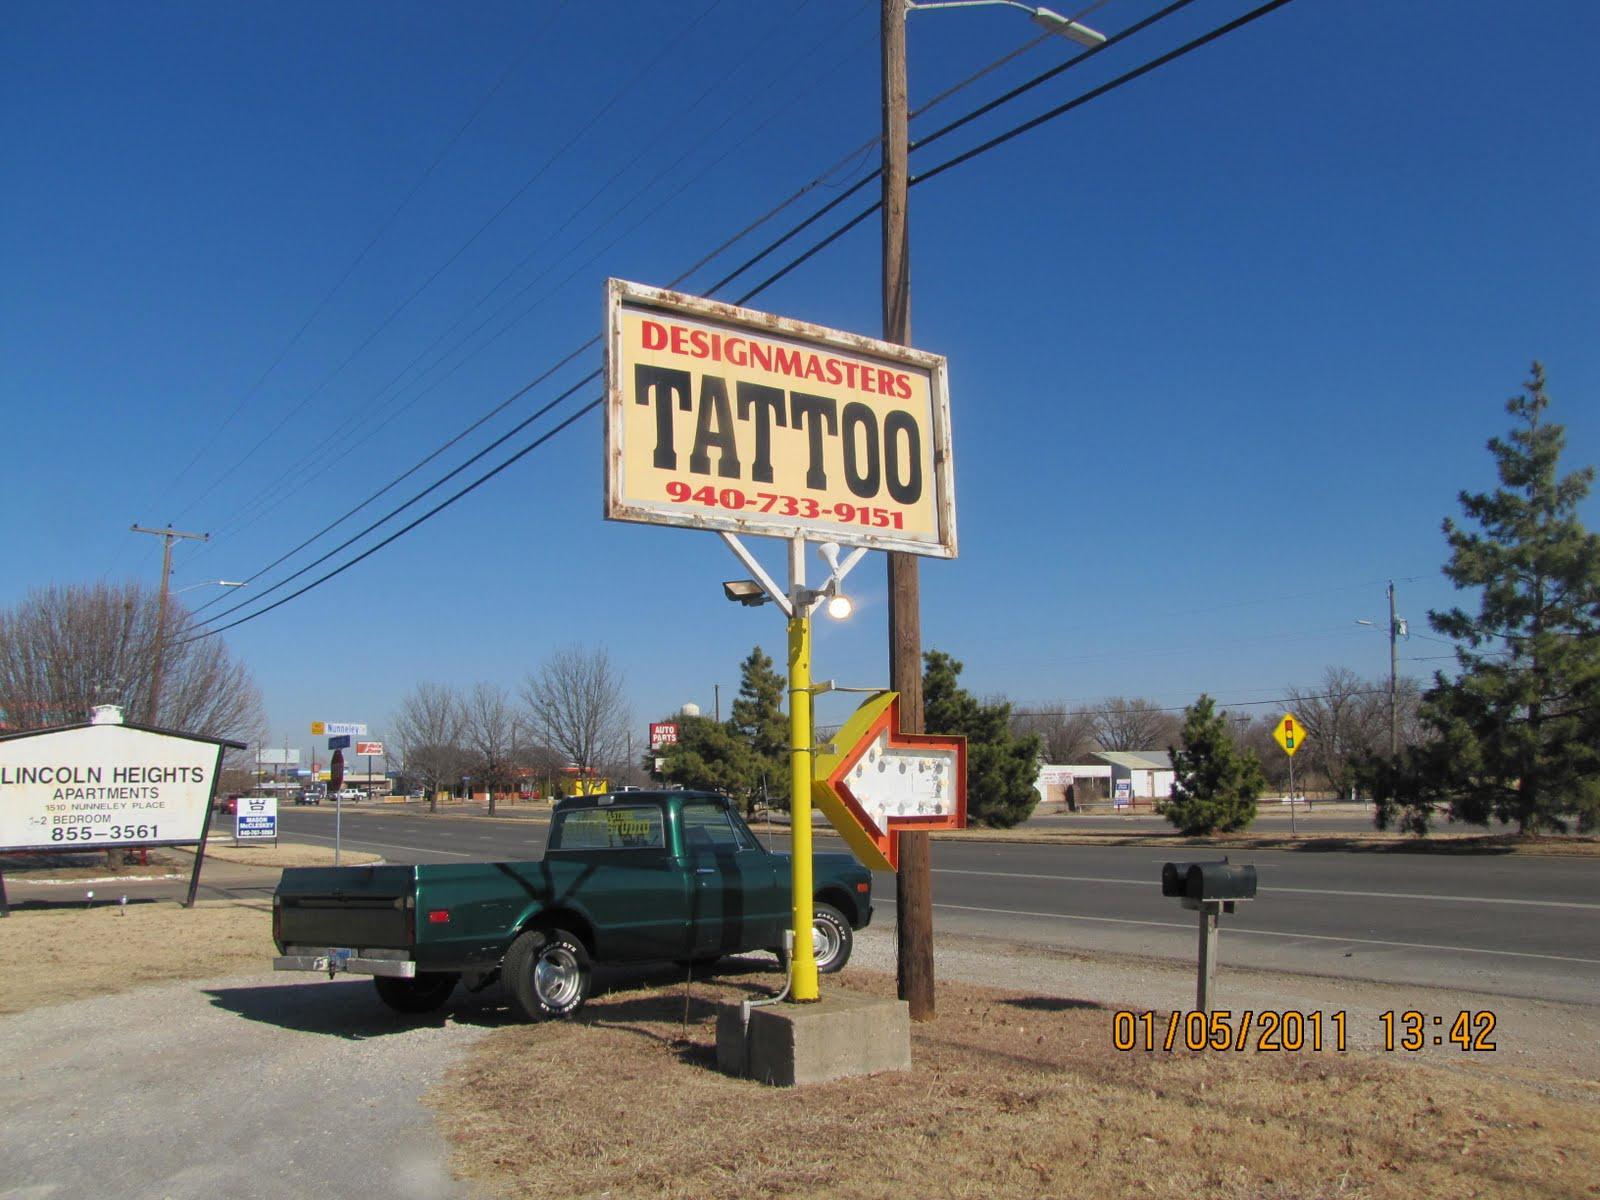 north texas bikers iv designmasters tattoo studio 1 5 2011